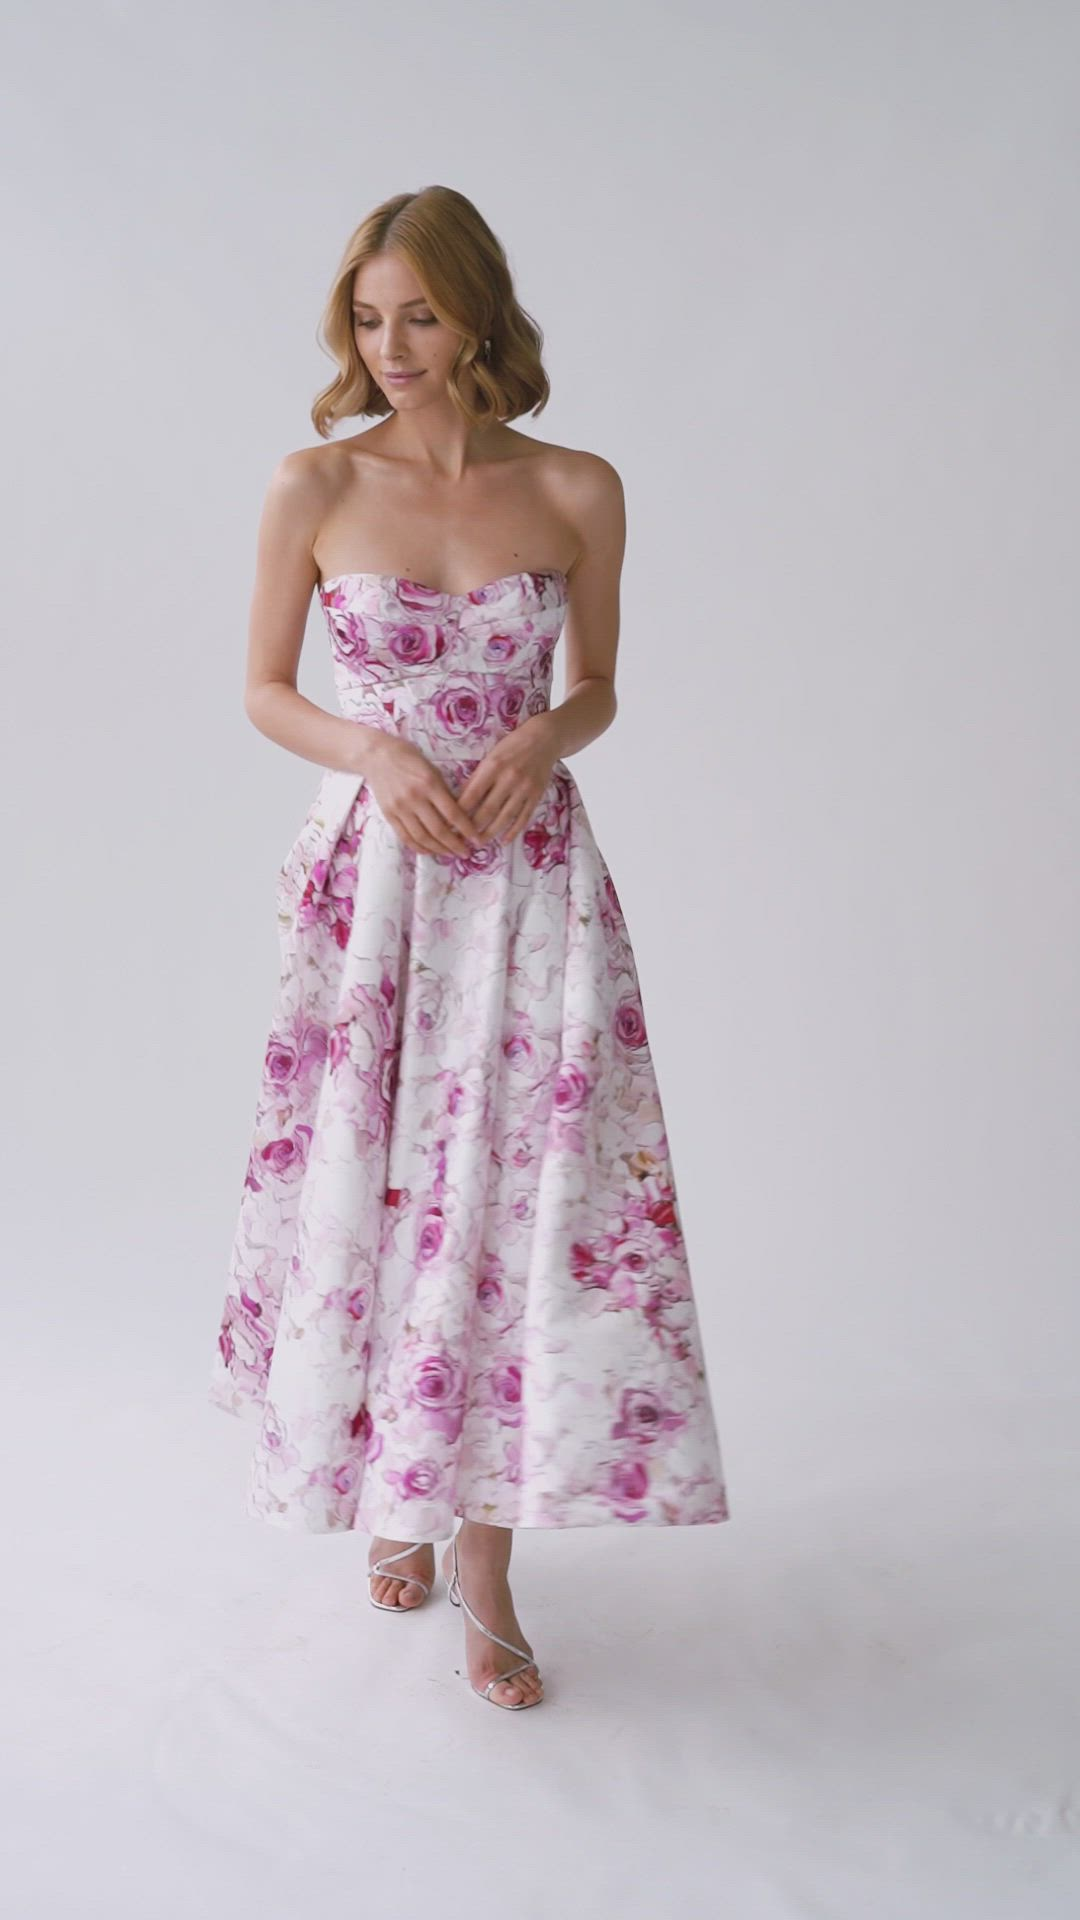 10 Ideal Dresses In Floral Print Video In 2021 Strapless Cocktail Dresses Elegant Dresses Long Midi Cocktail Dress [ 1920 x 1080 Pixel ]